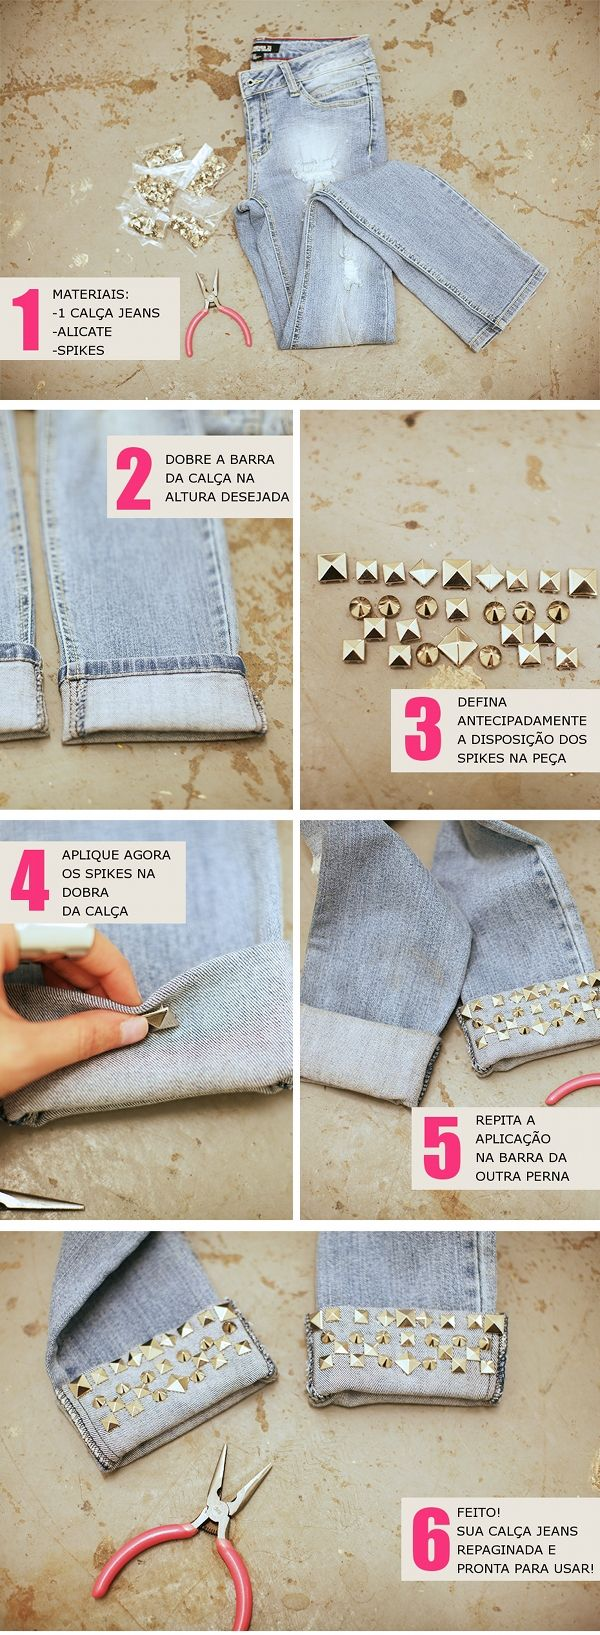 DIY: Customizar Calça Jeans - Decor e Salto Alto - Blog de Moda